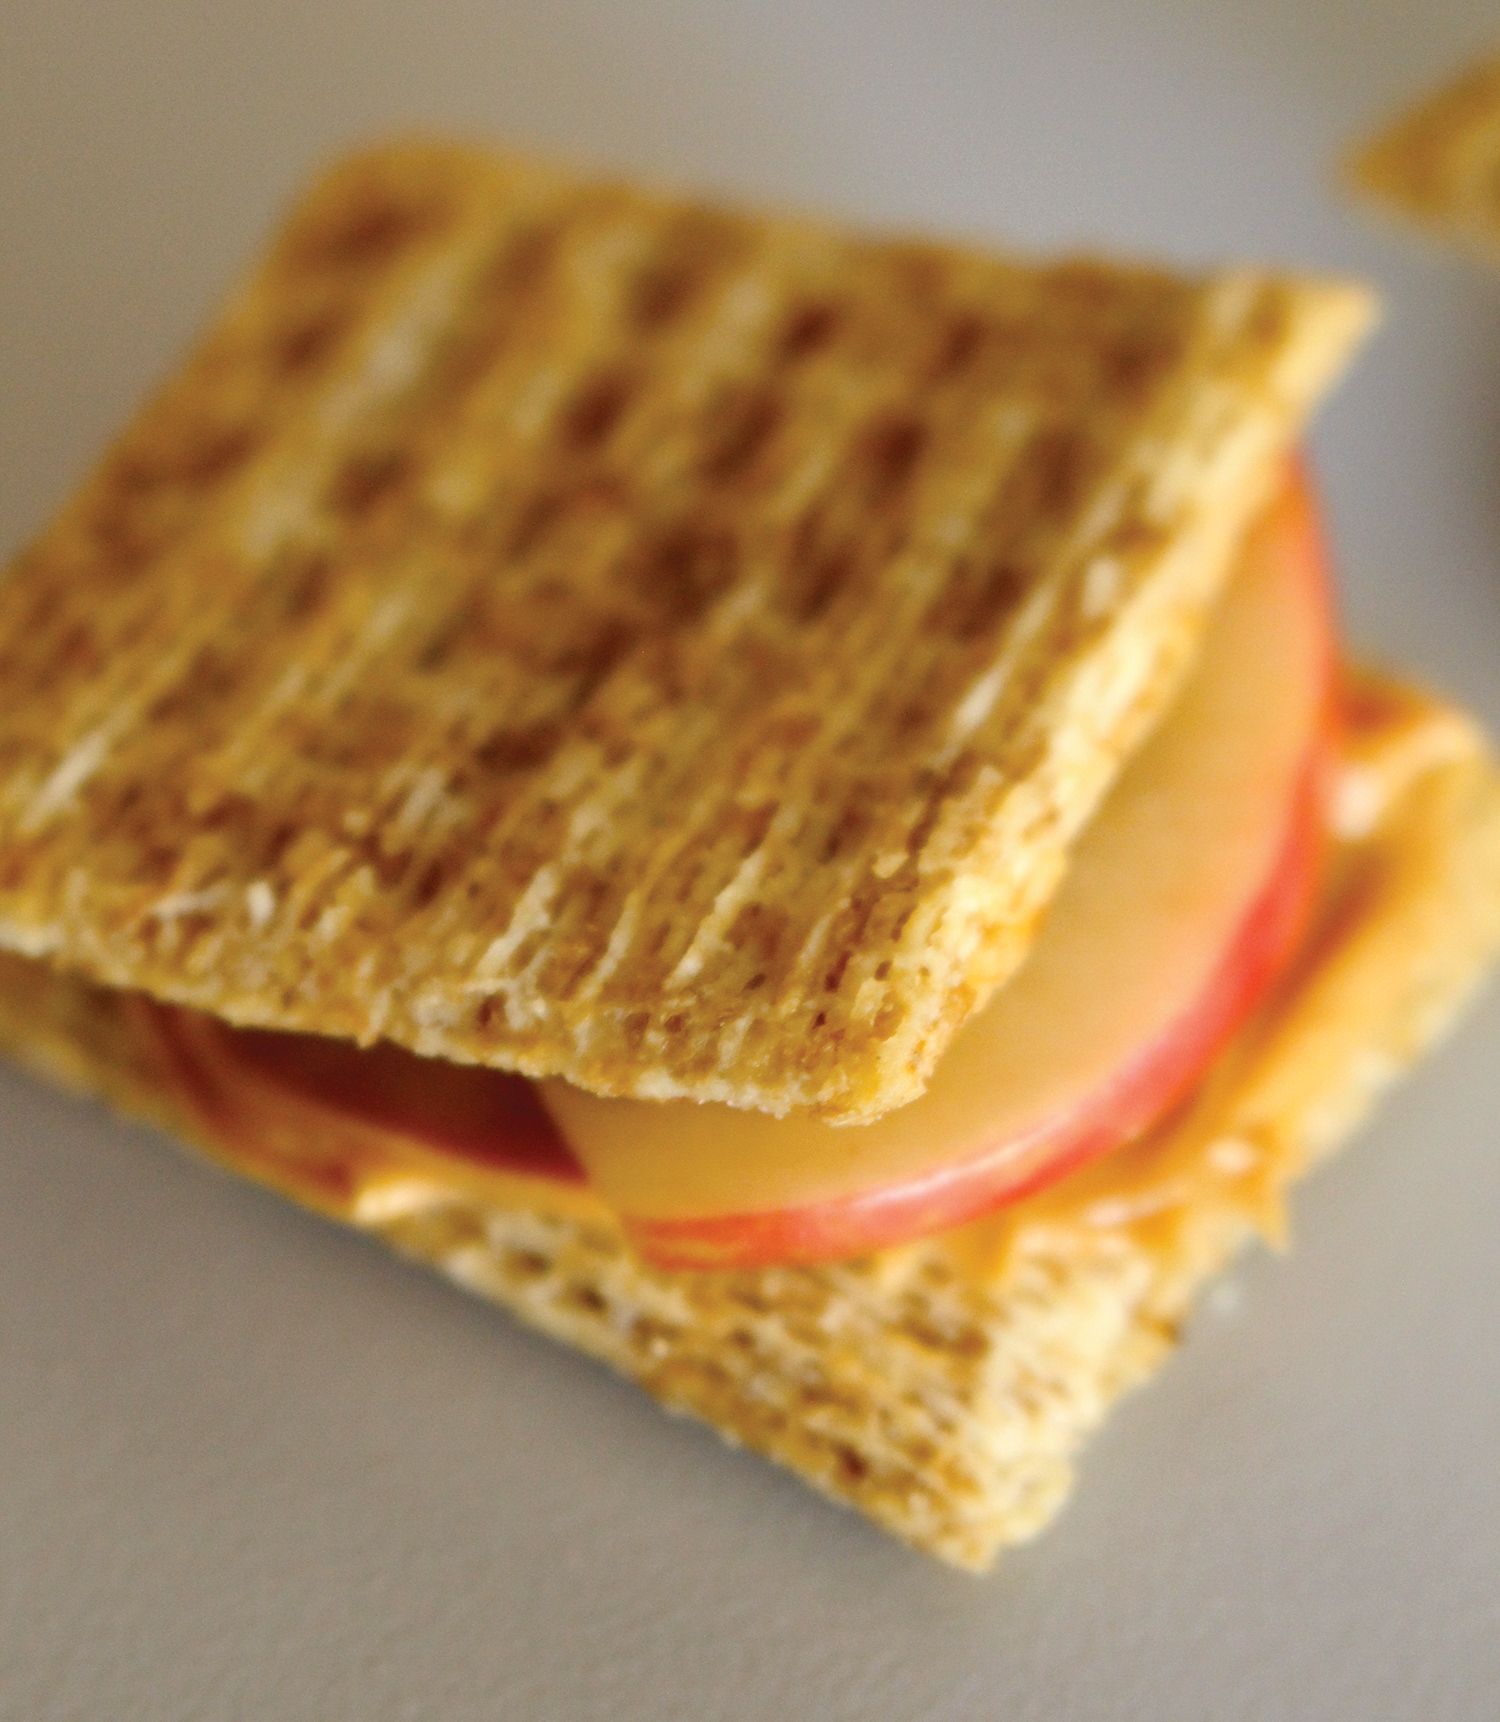 Photo: Whole grain cracker sandwich.